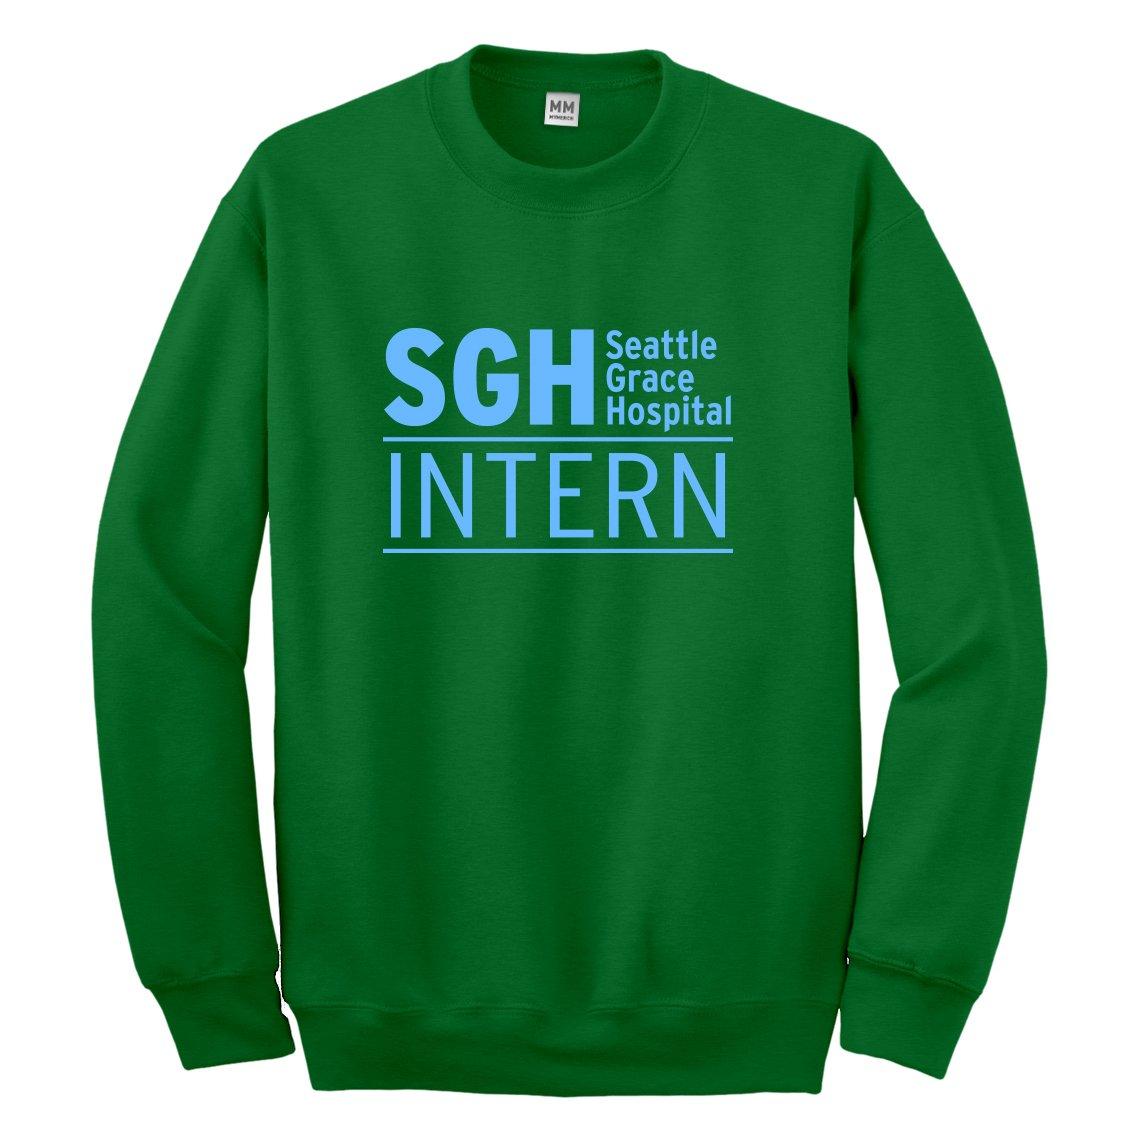 Indica Plateau Intern Seattle Grace Hospital Sweatshirt 3312-C